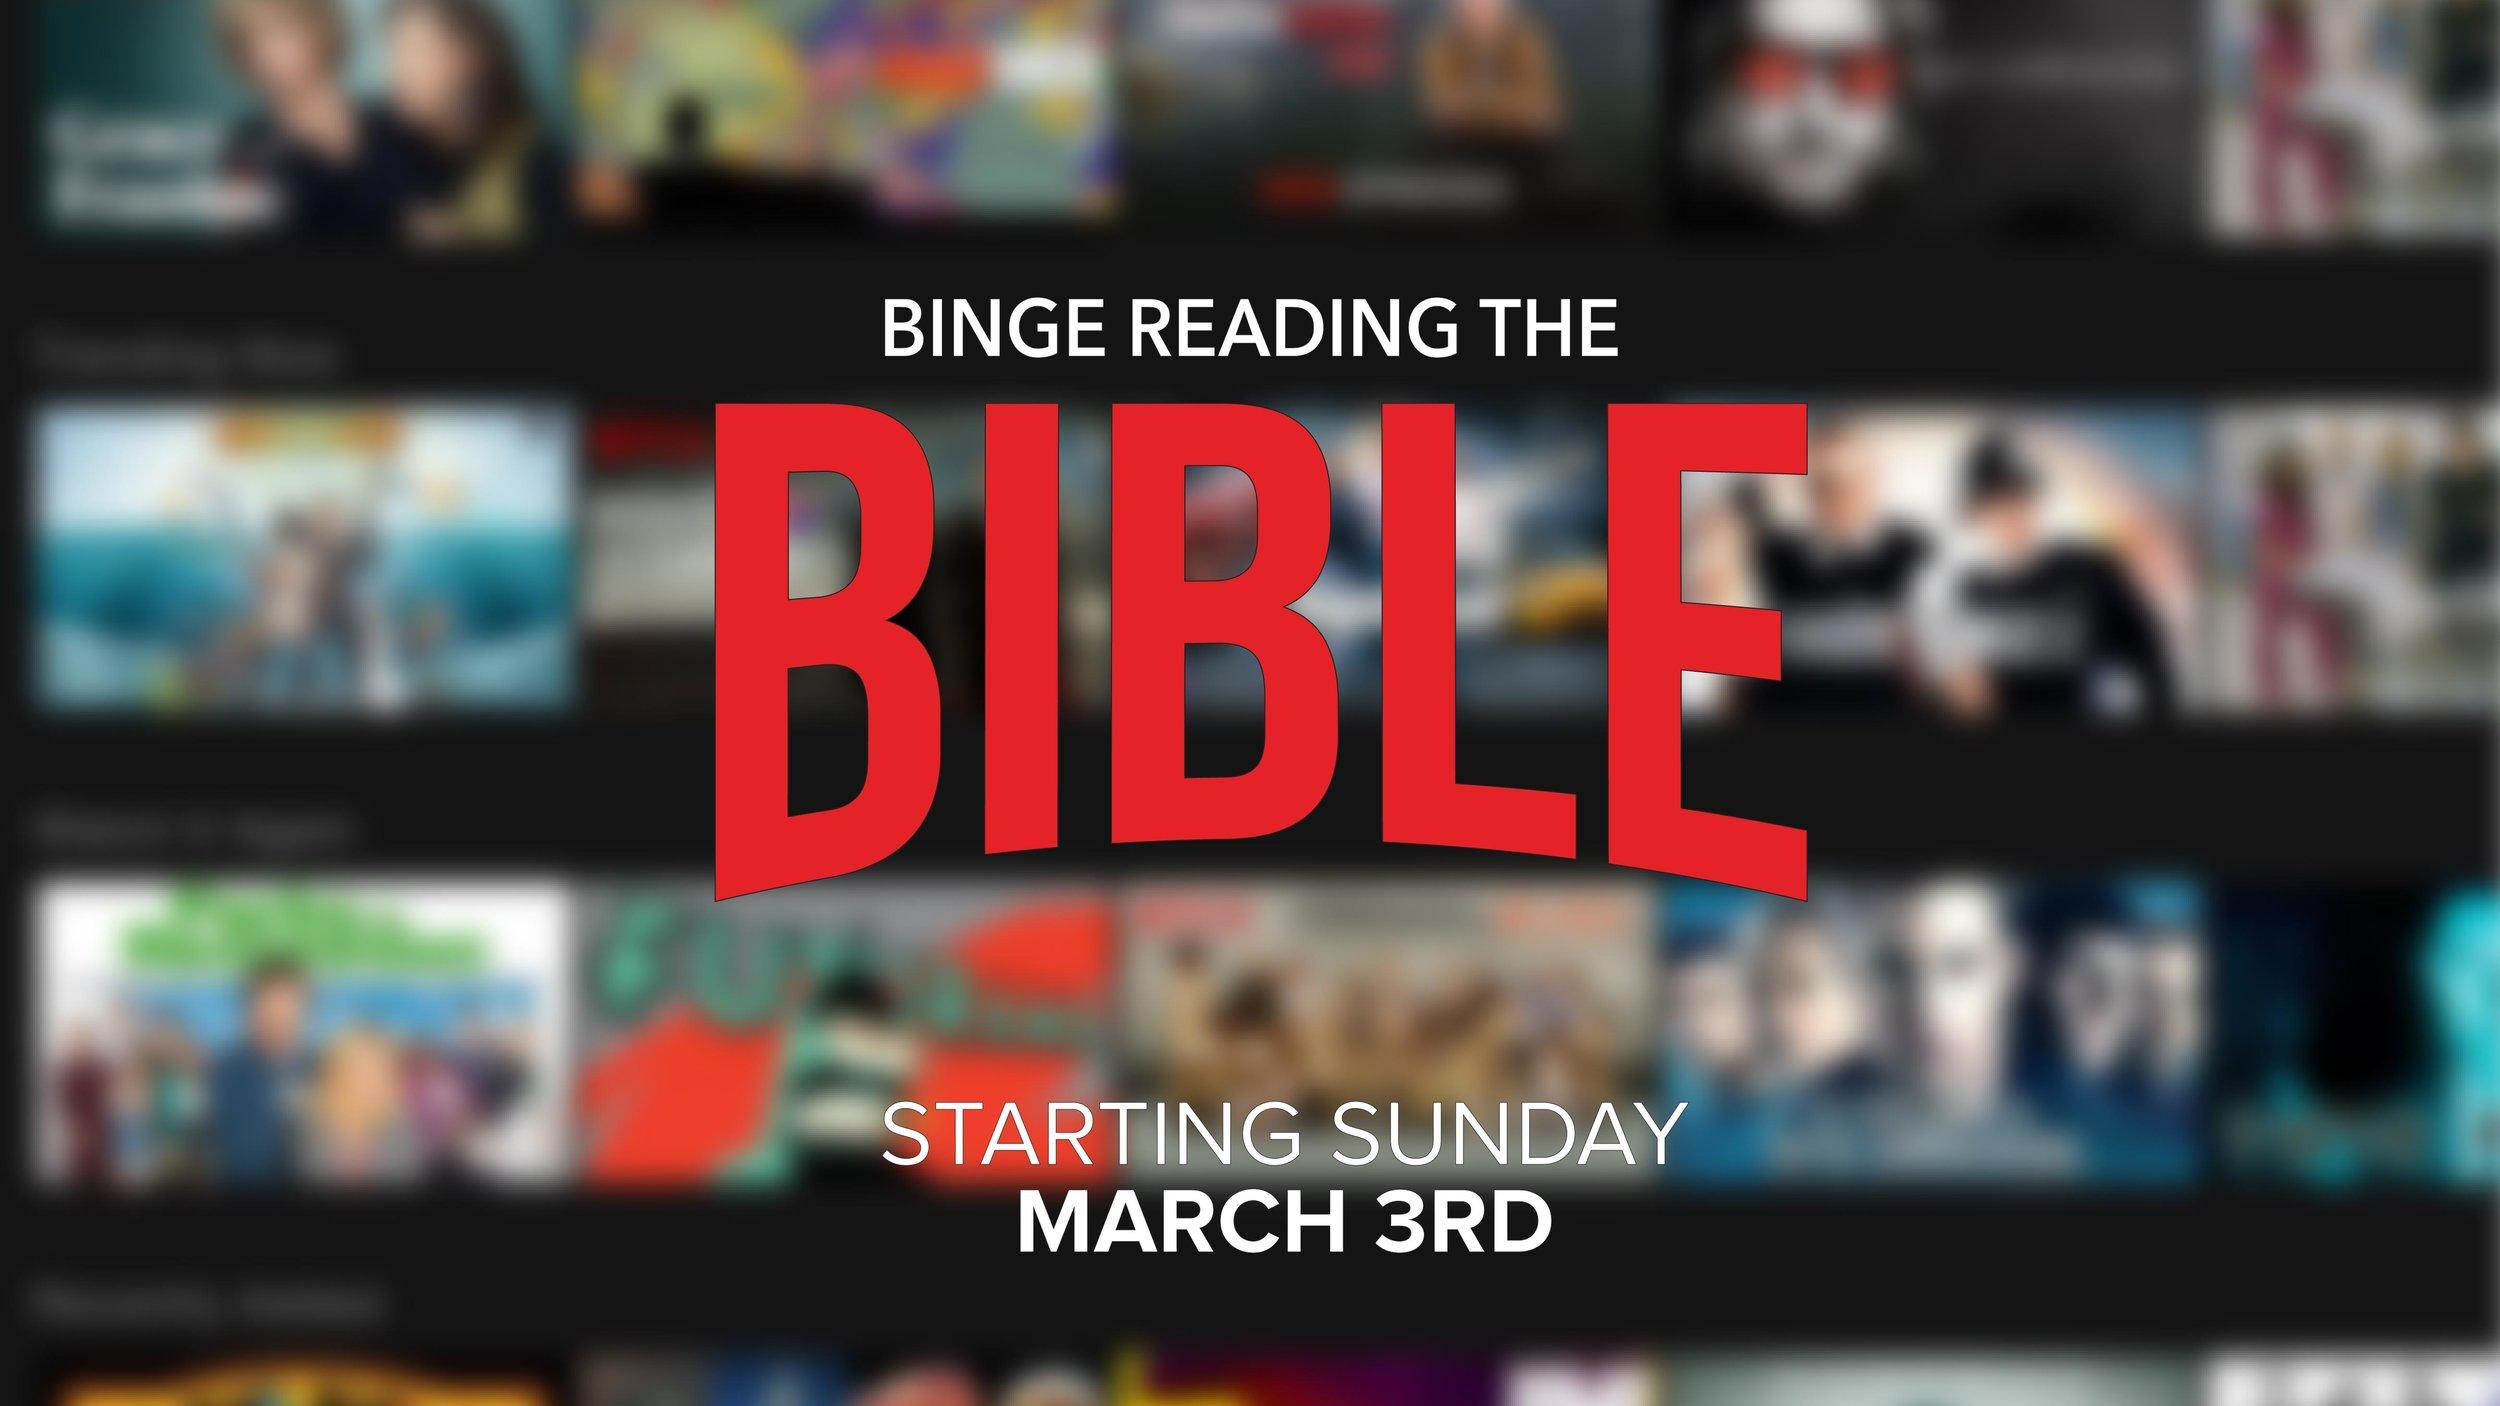 SS_Binge-Reading-The-Bible - Main-01.jpg